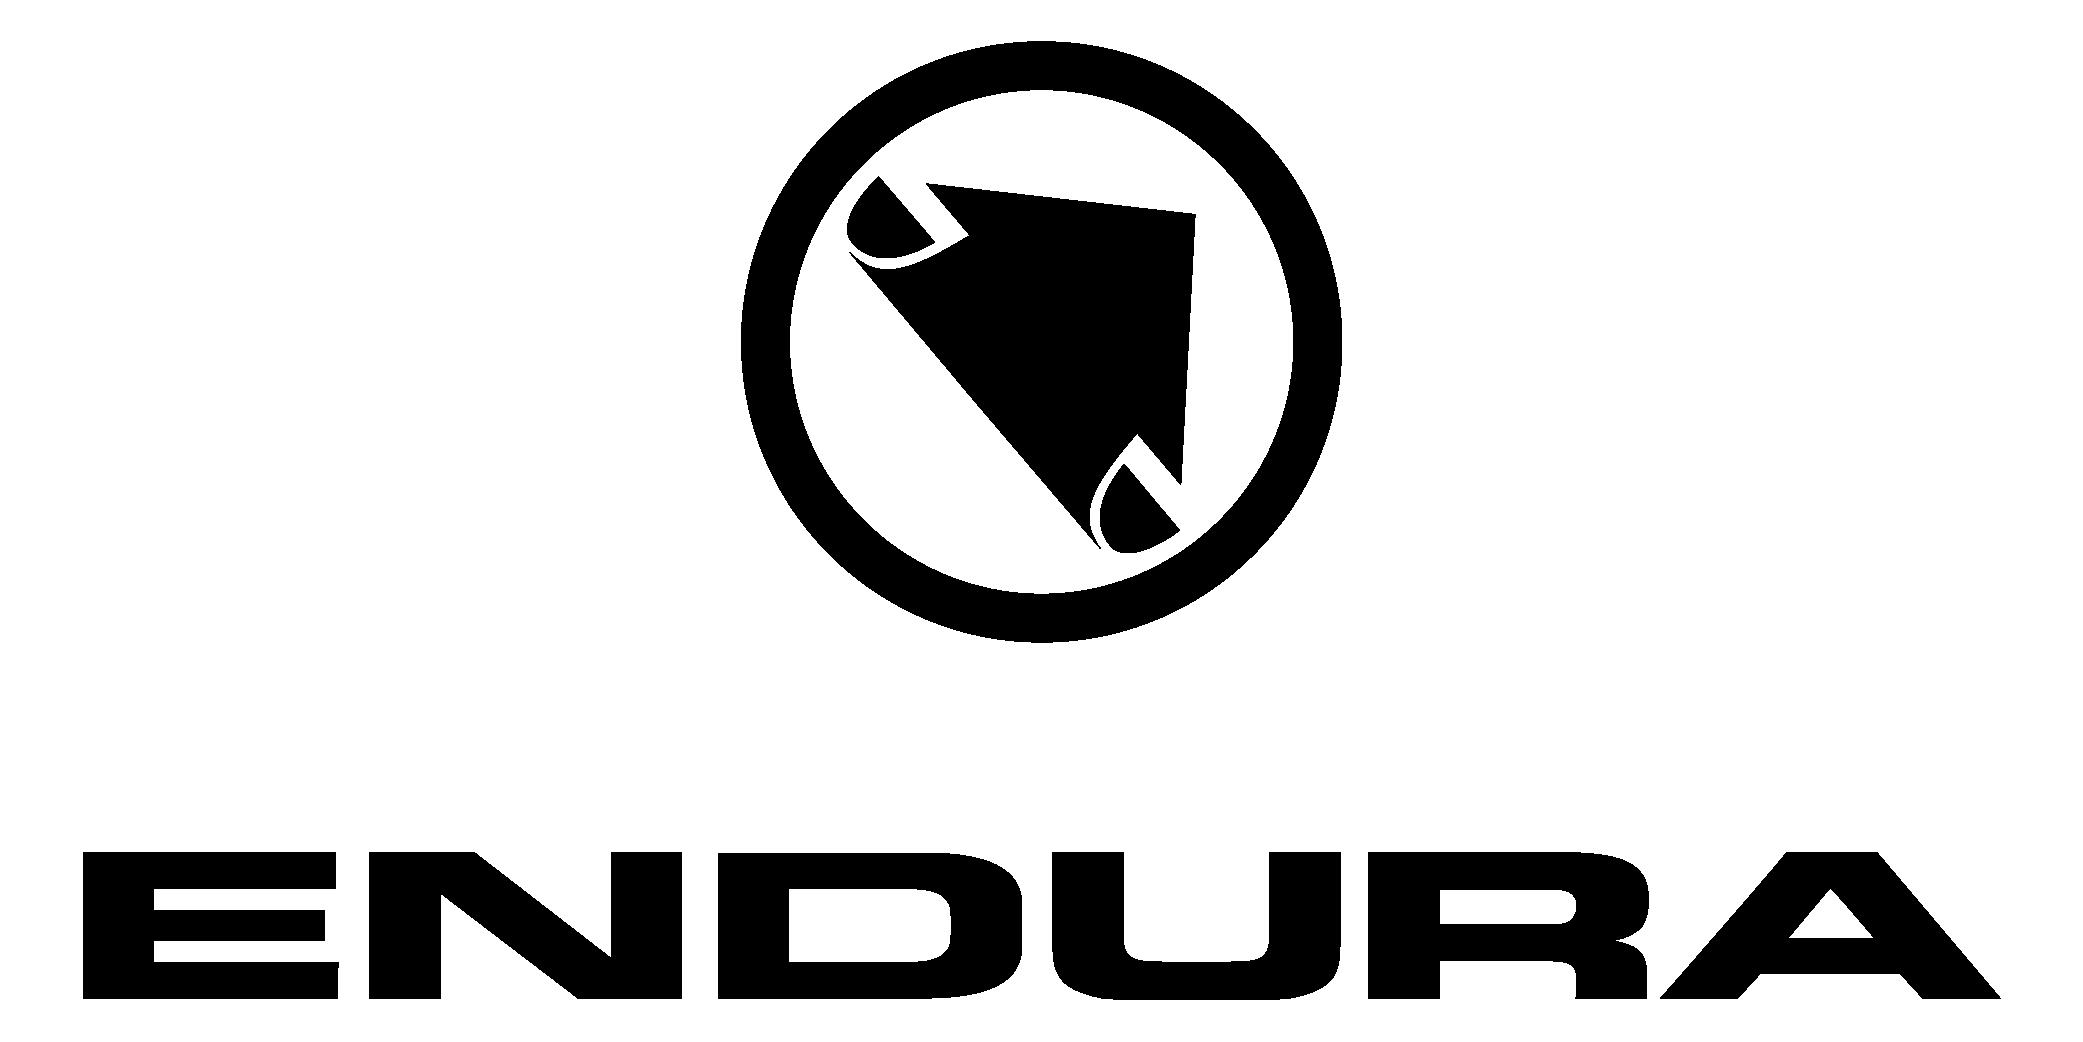 Endura, Logo/Brand | matadorworld.innsbruck